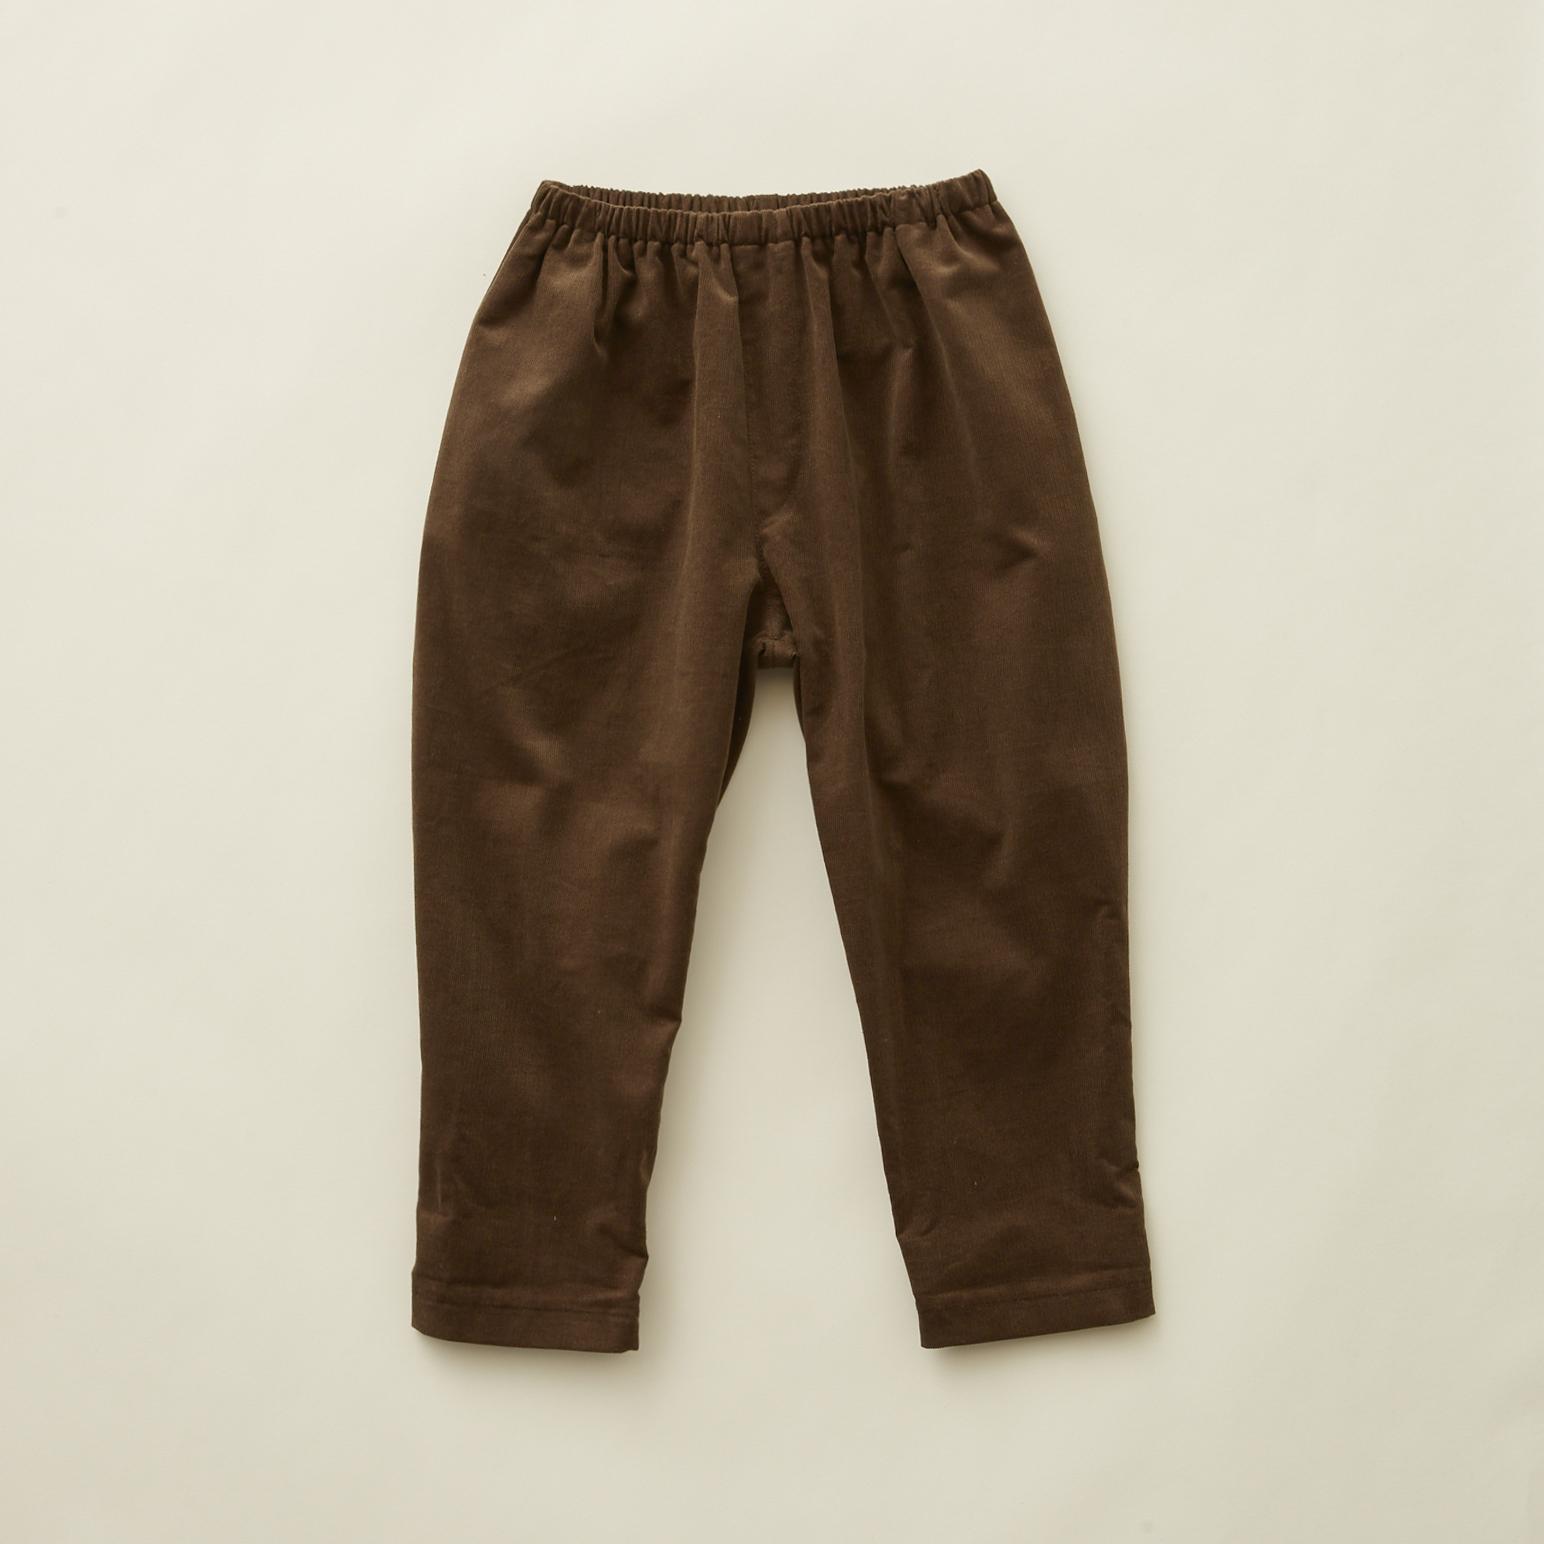 《eLfinFolk 2020AW》corduroy  pants / brown / 110-130cm